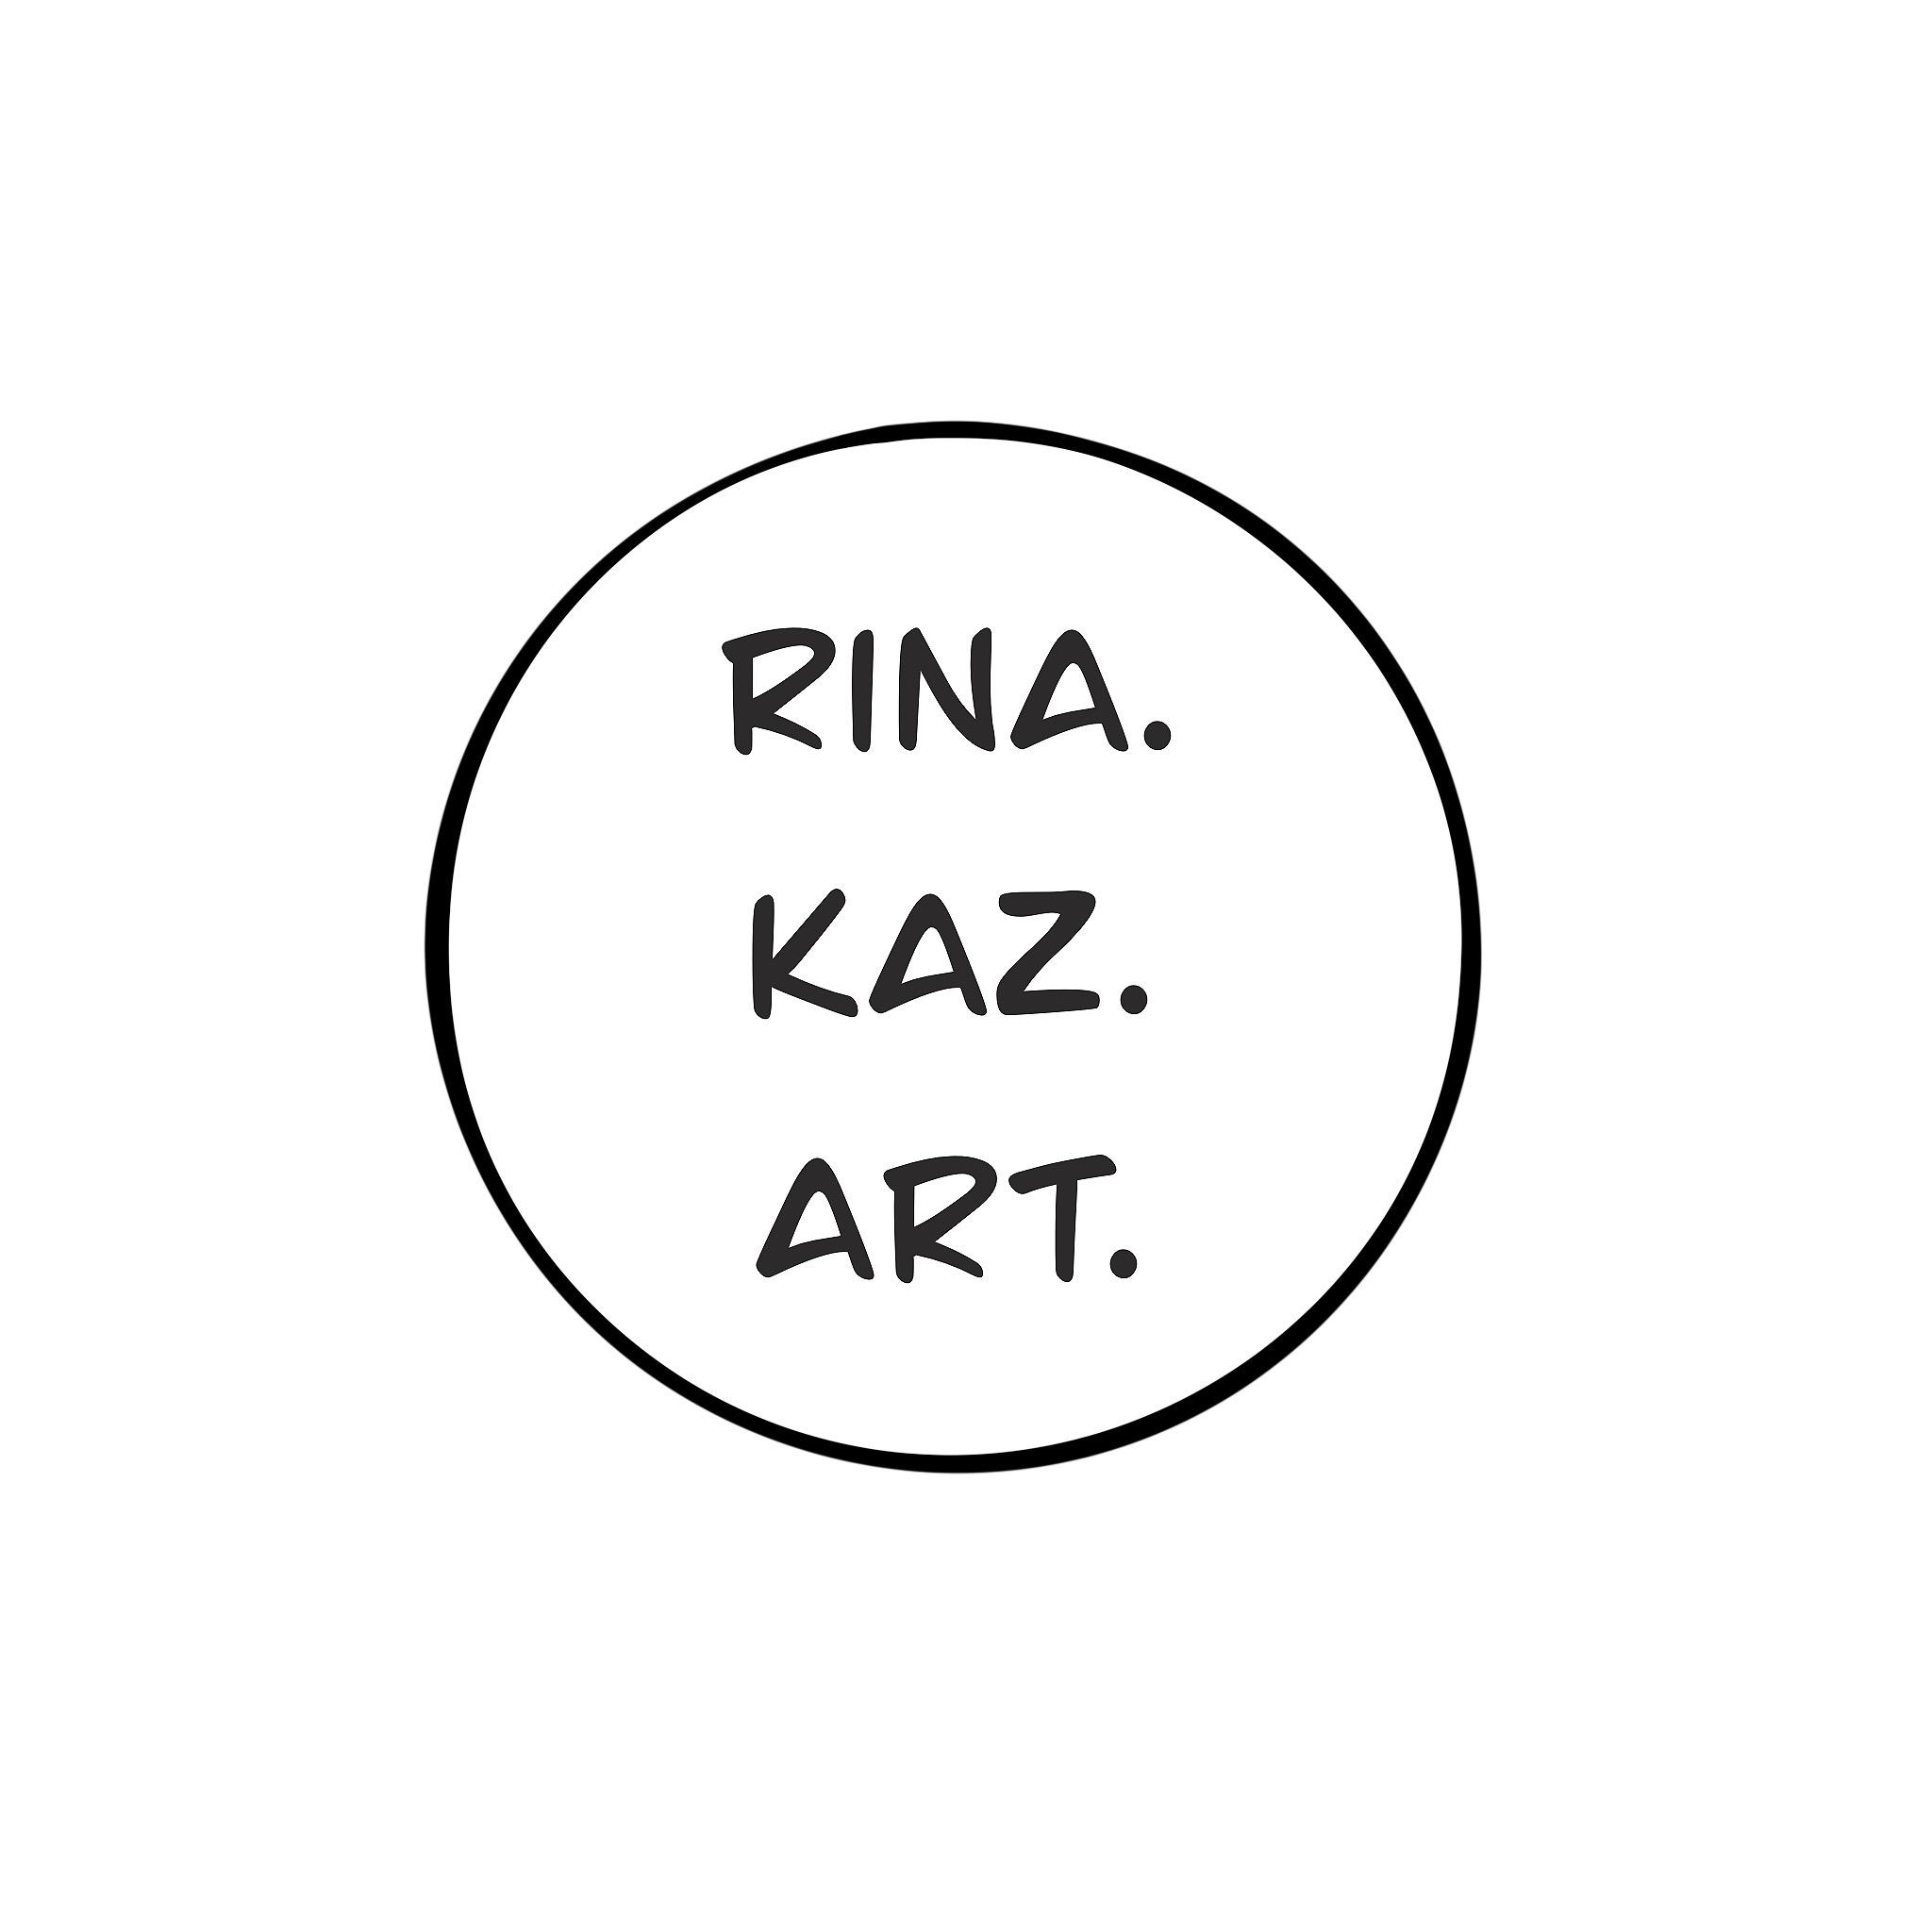 RinaKazArt